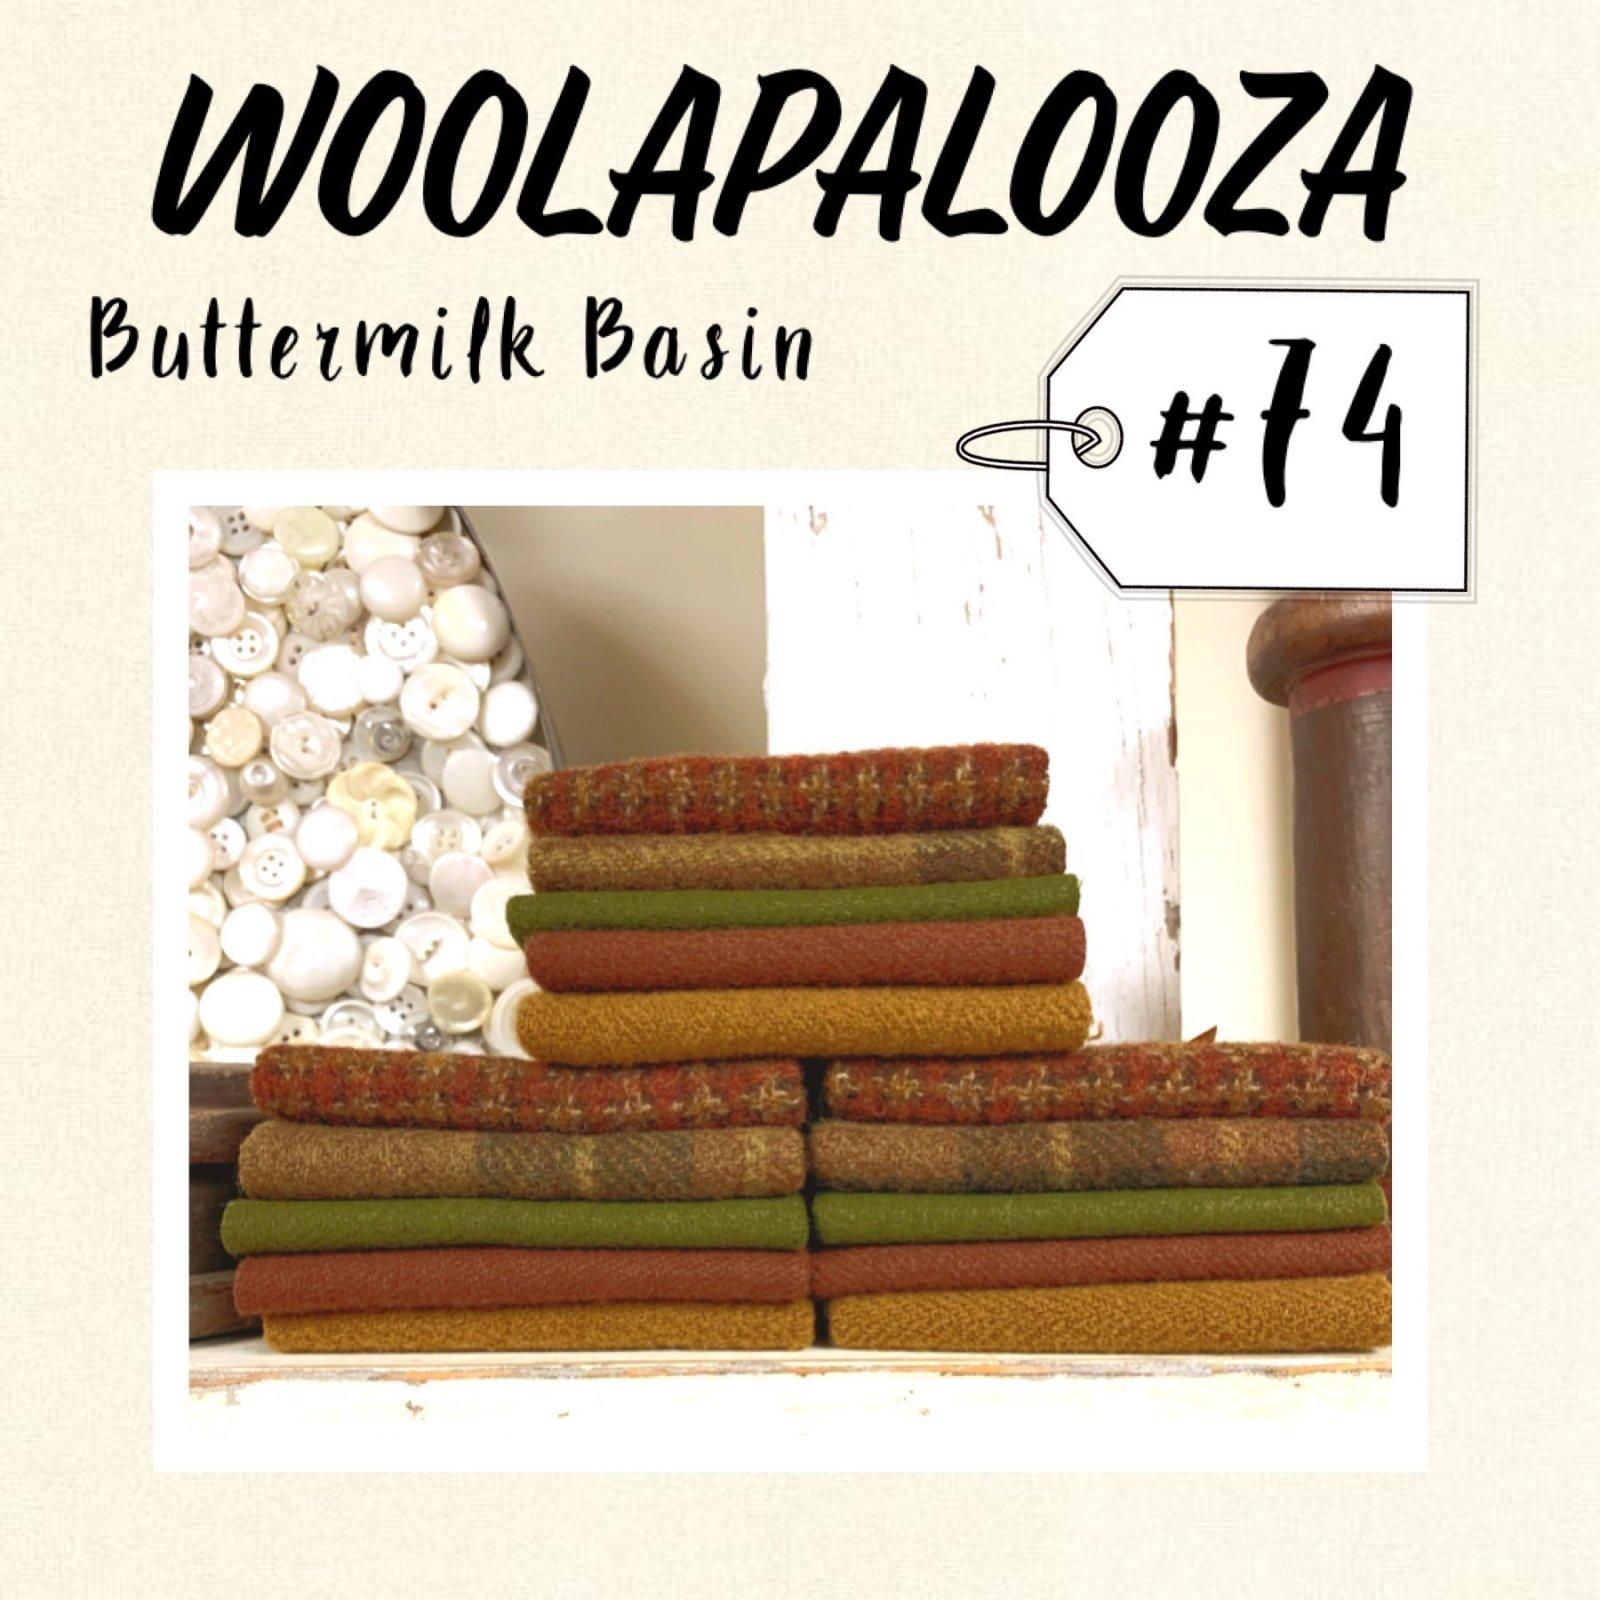 Woolapalooza #74 Wool Bundle